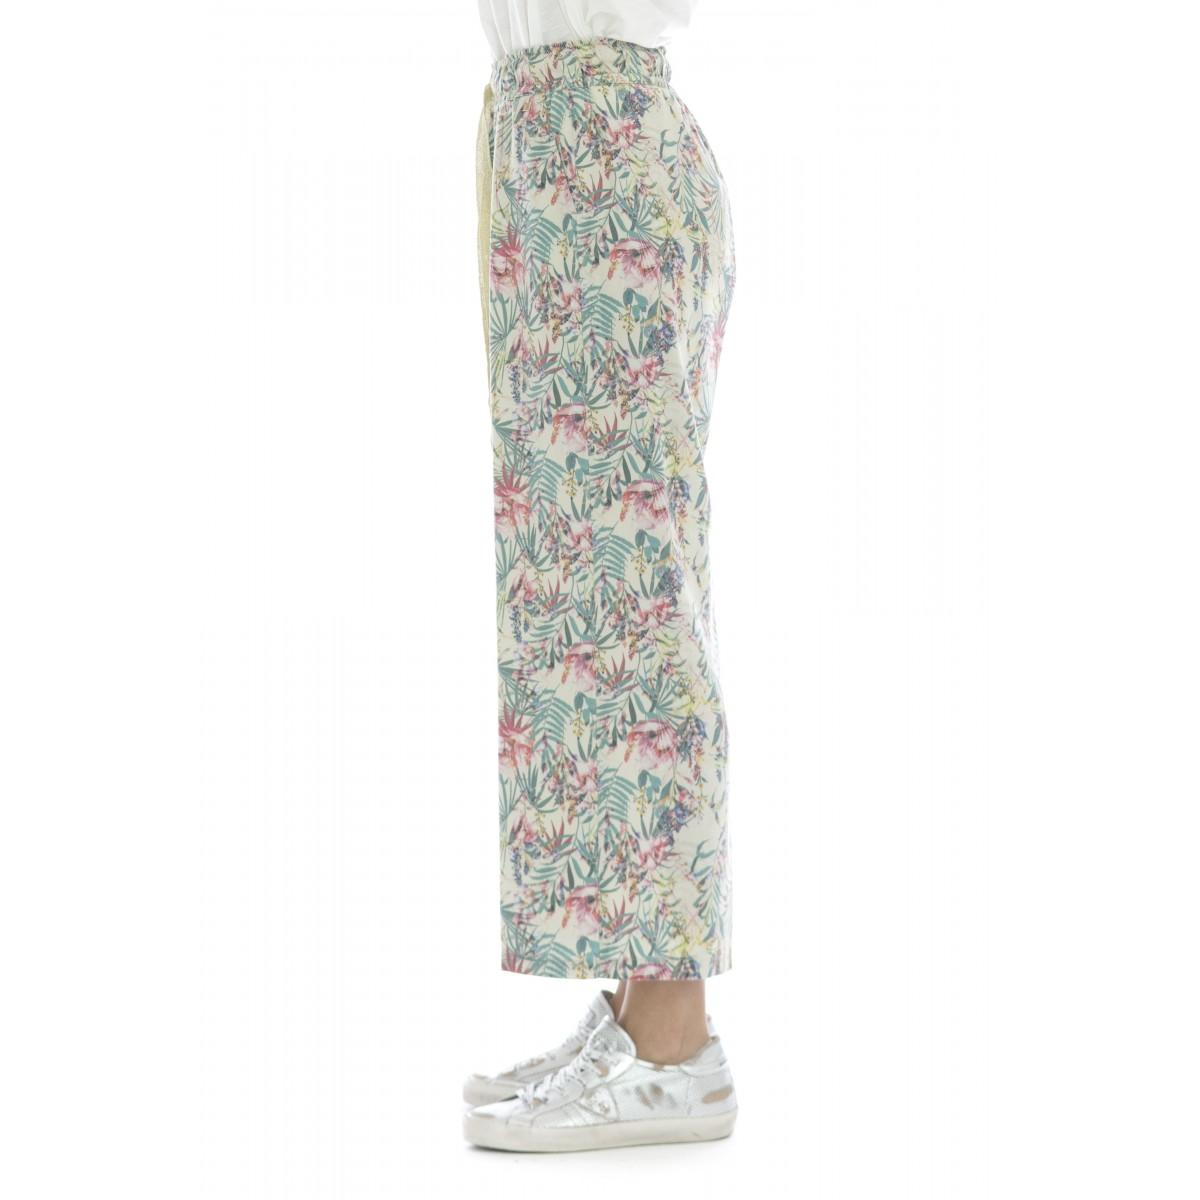 Pantalone donna - Aster pantalone elastico